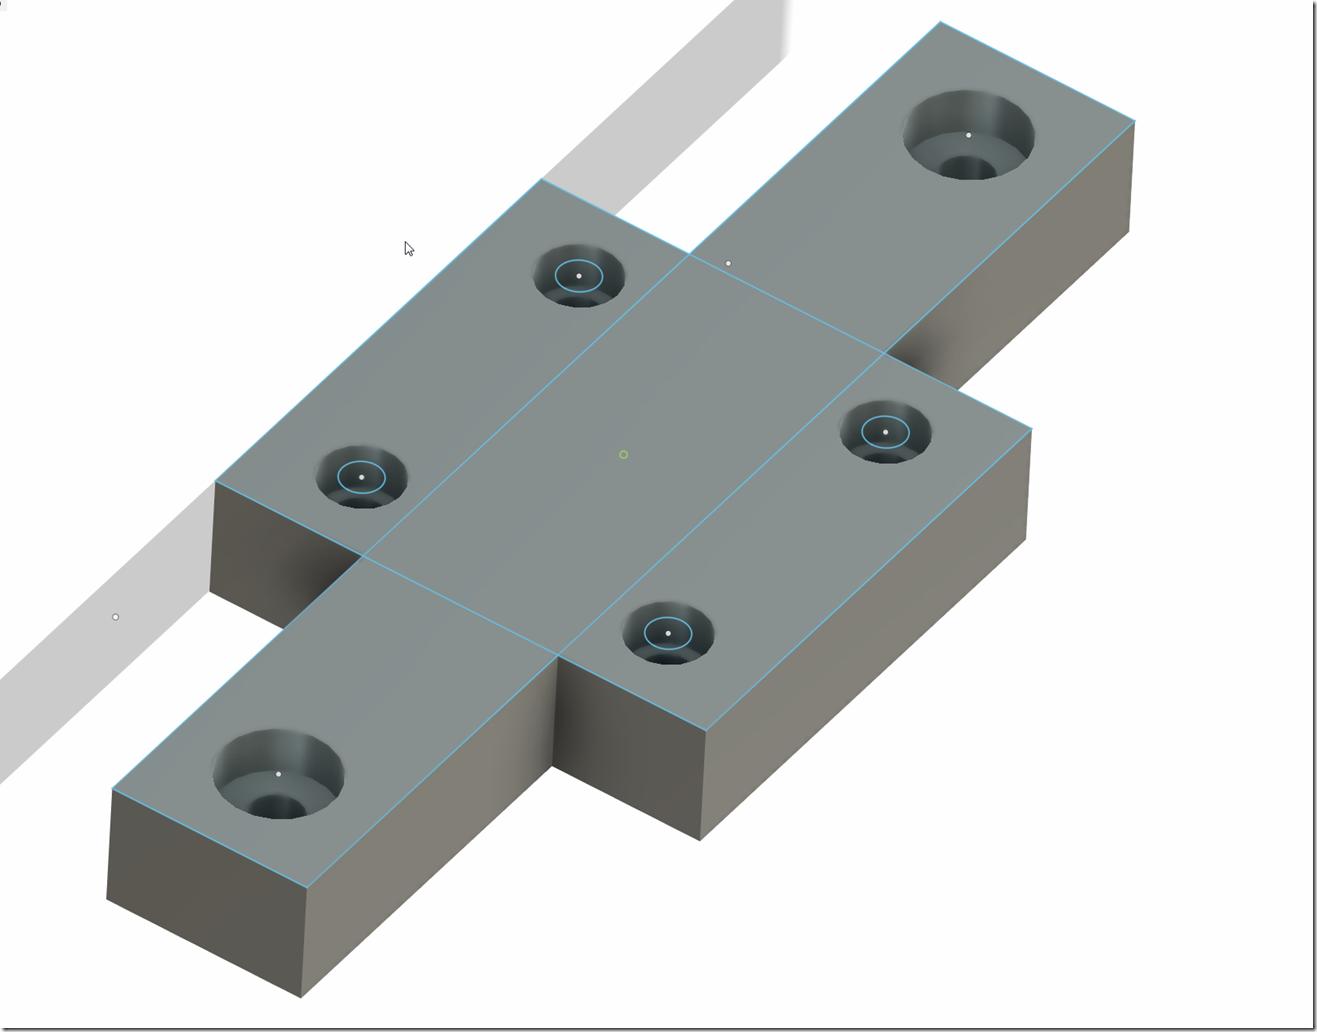 2020-06-06 19_22_21-Autodesk Fusion 360